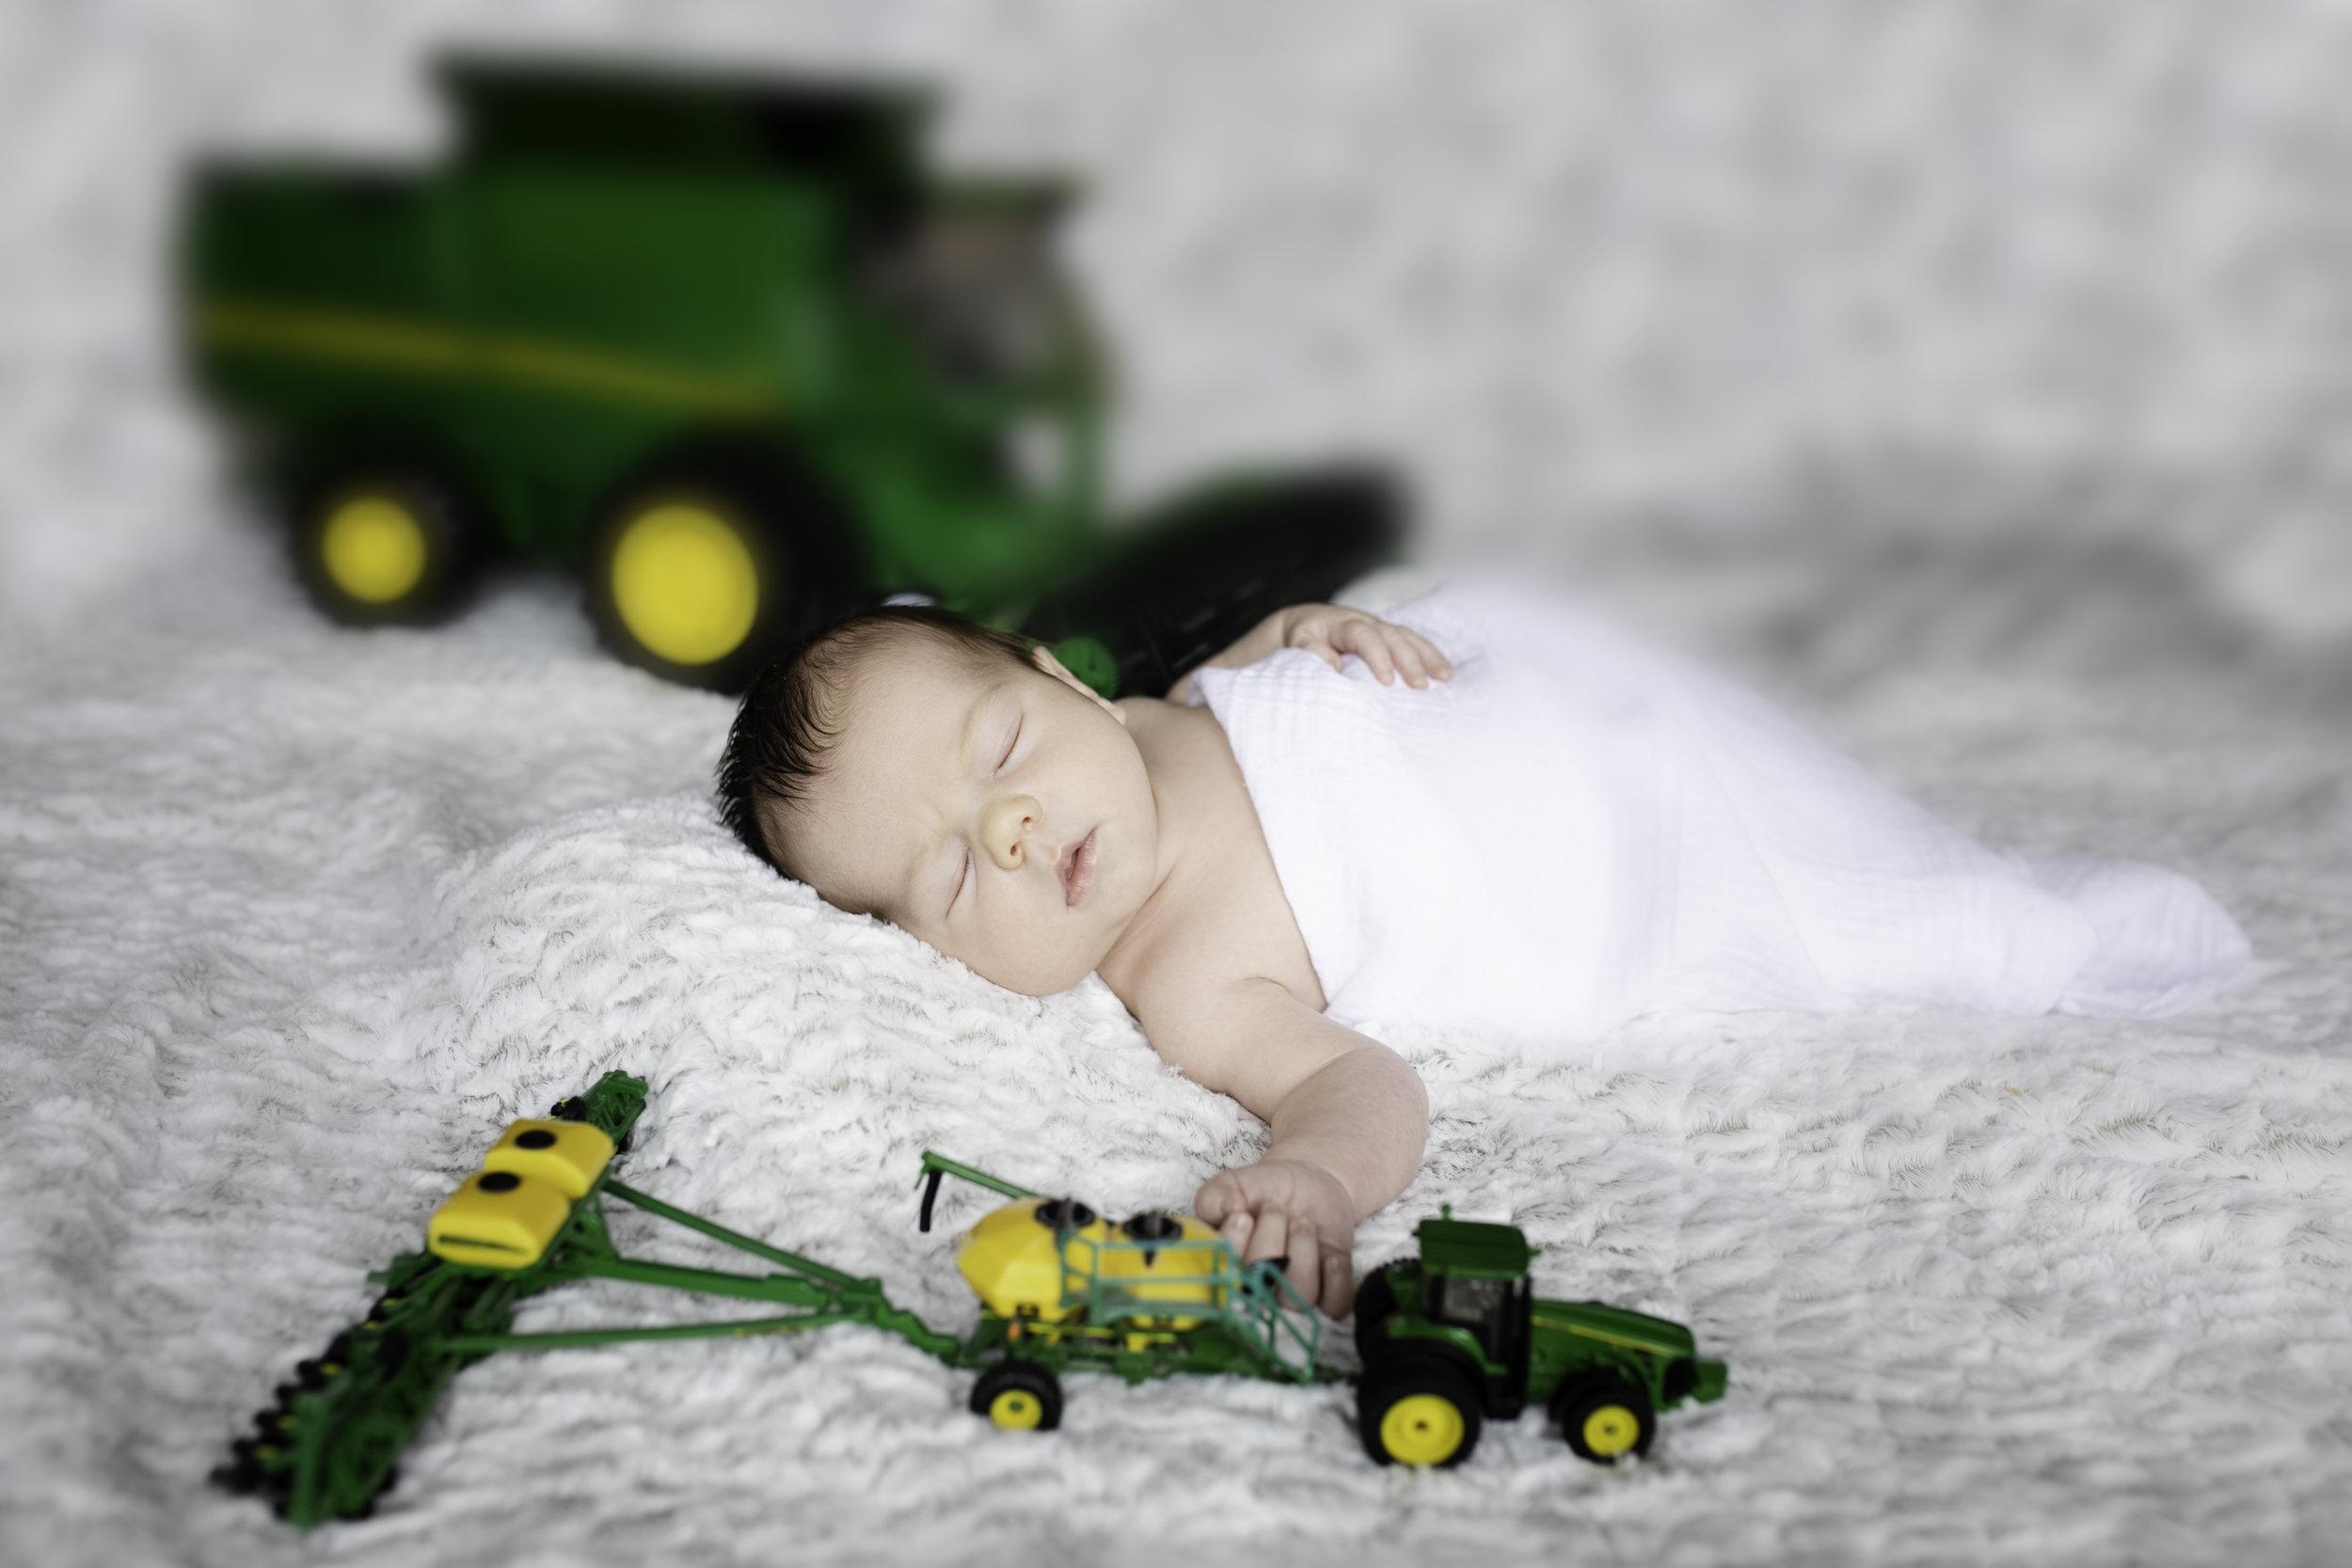 Newborn-London-Jodie-Aldred-Photography-Chatham-Middlesex-Lambton-Baby-John-Deere-family-parents-ontario.jpg